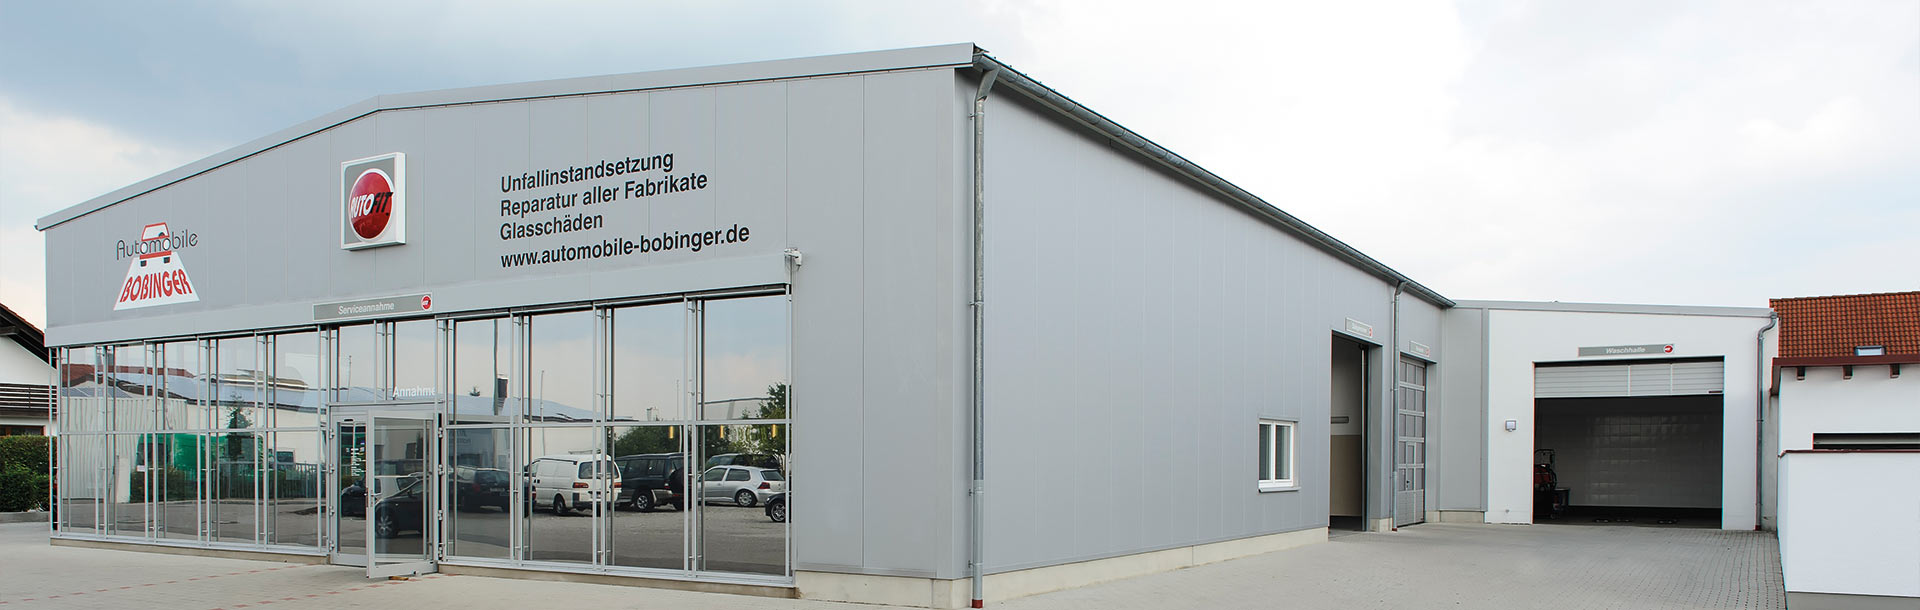 automobile bobinger k nigsbrunn bei augsburg autofit kfz meisterbetrieb. Black Bedroom Furniture Sets. Home Design Ideas